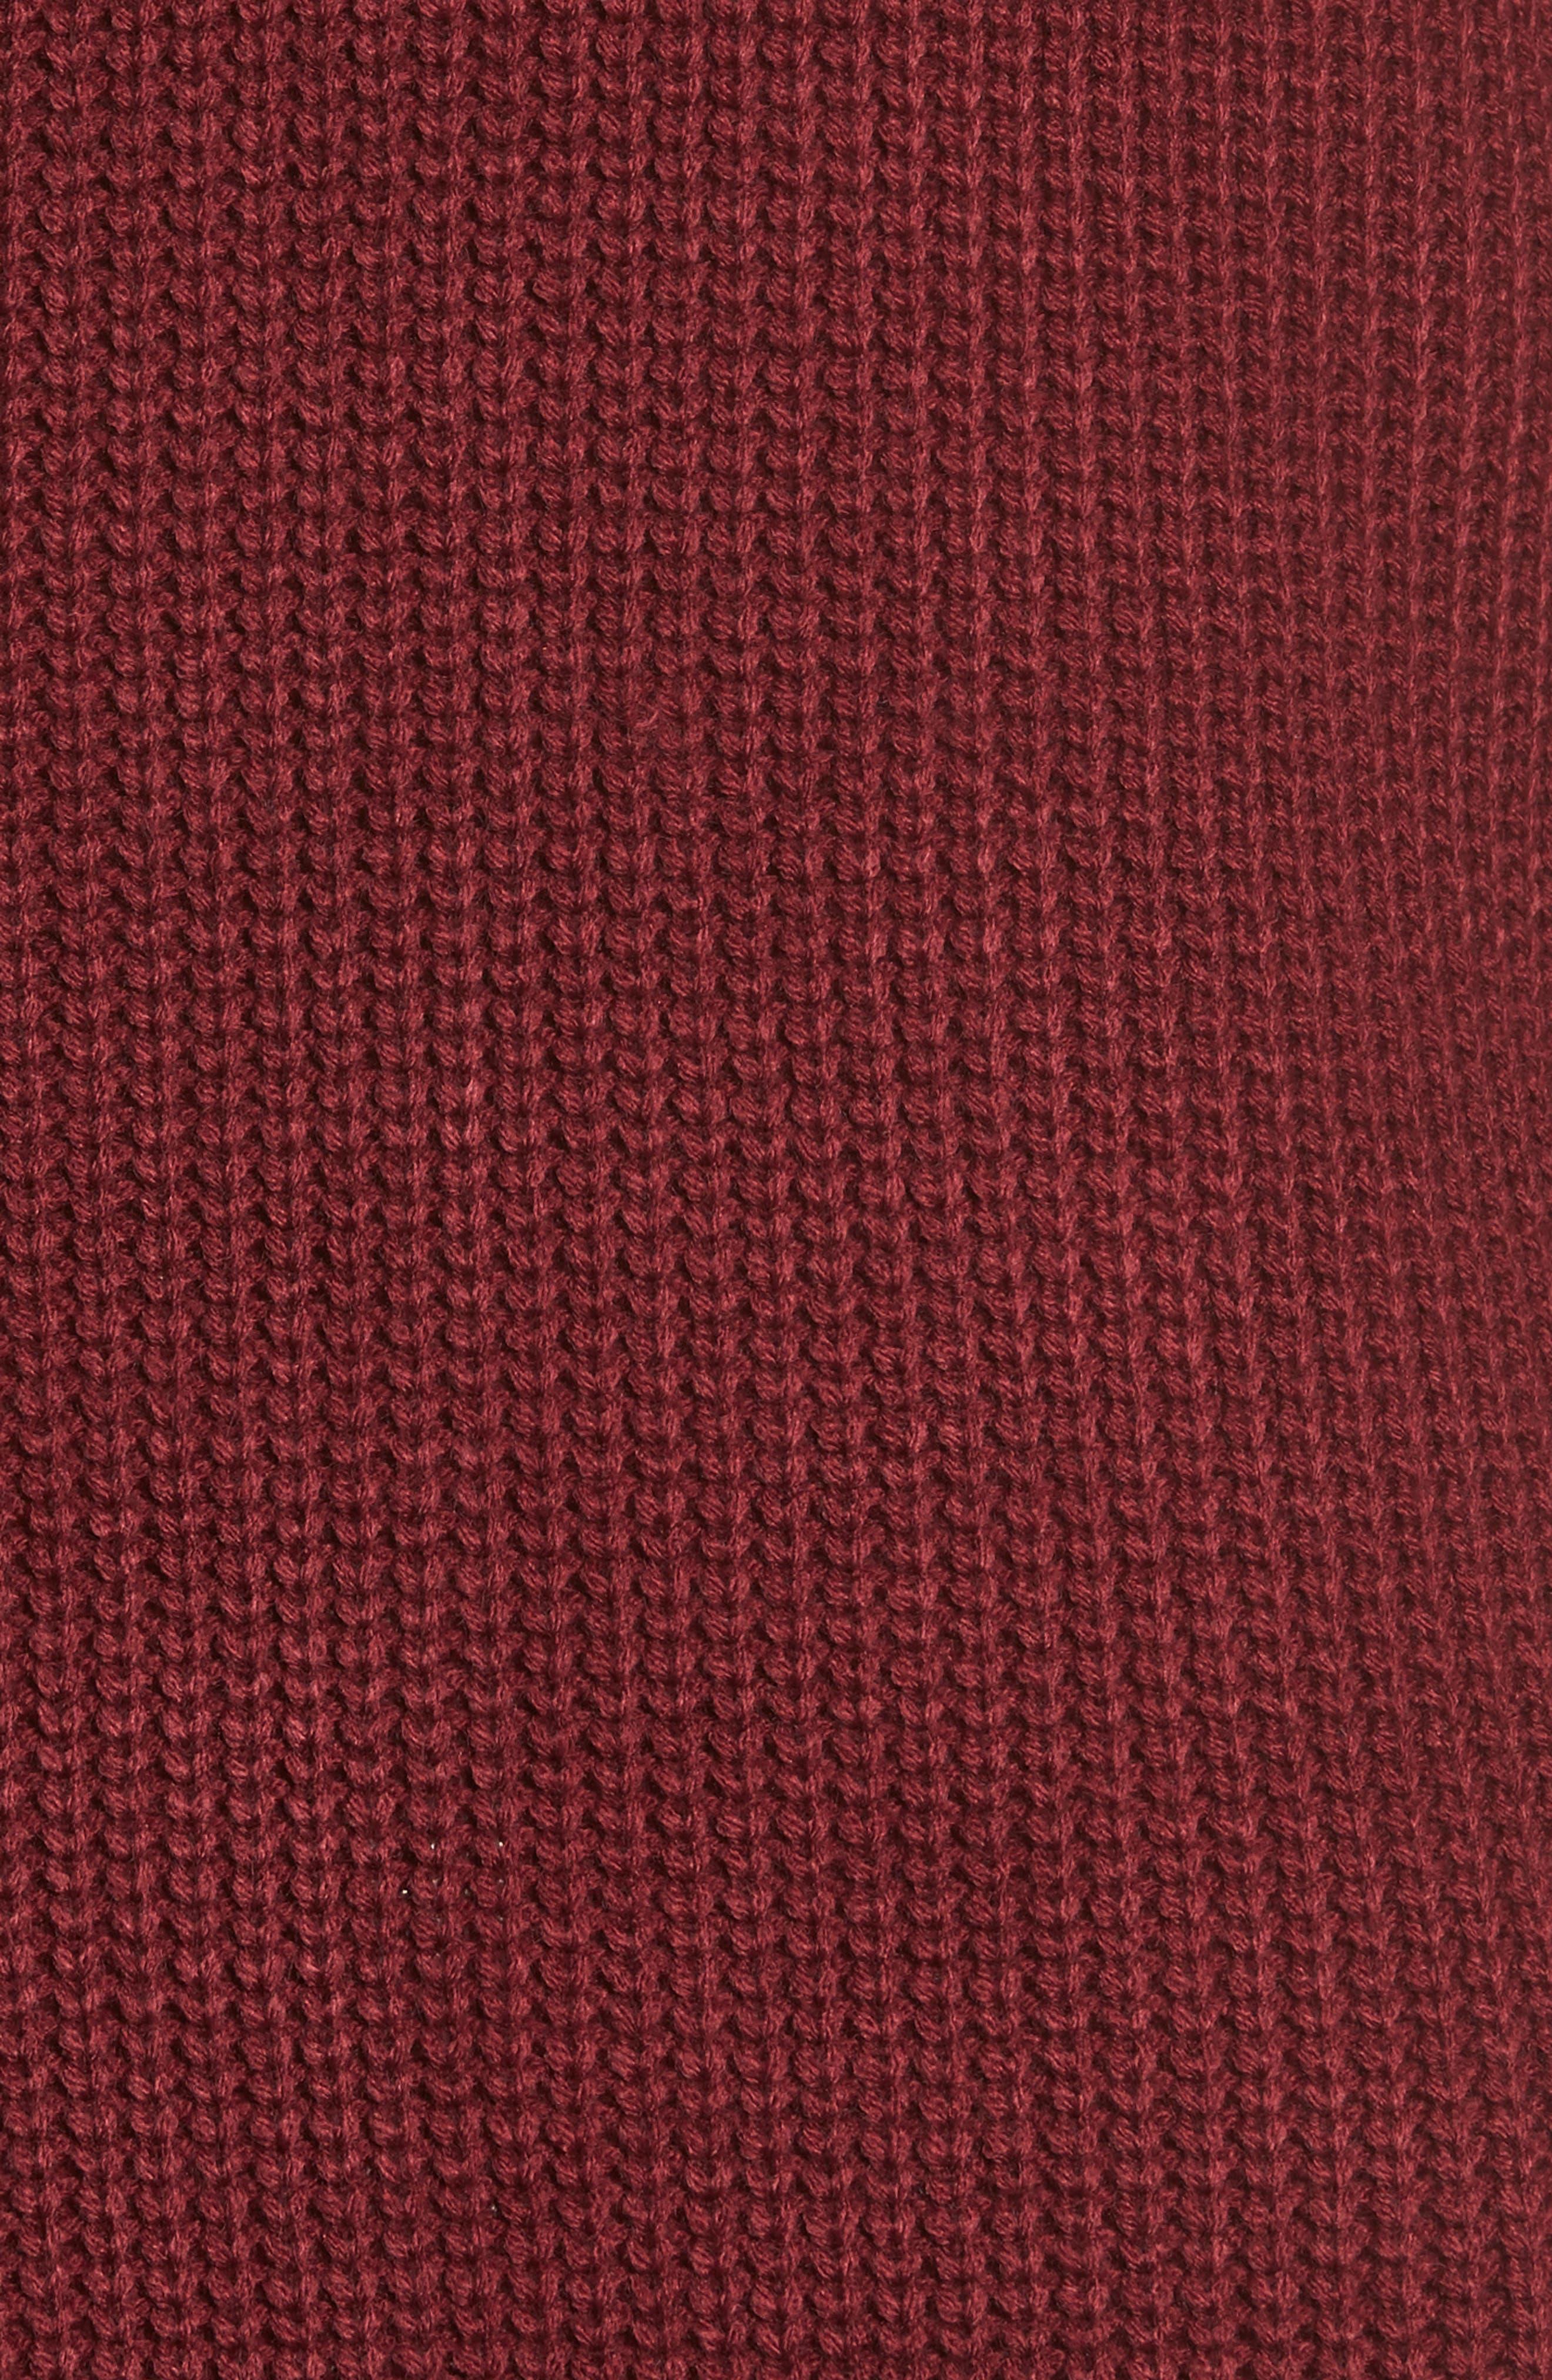 Foldover Off the Shoulder Sweater Dress,                             Alternate thumbnail 20, color,